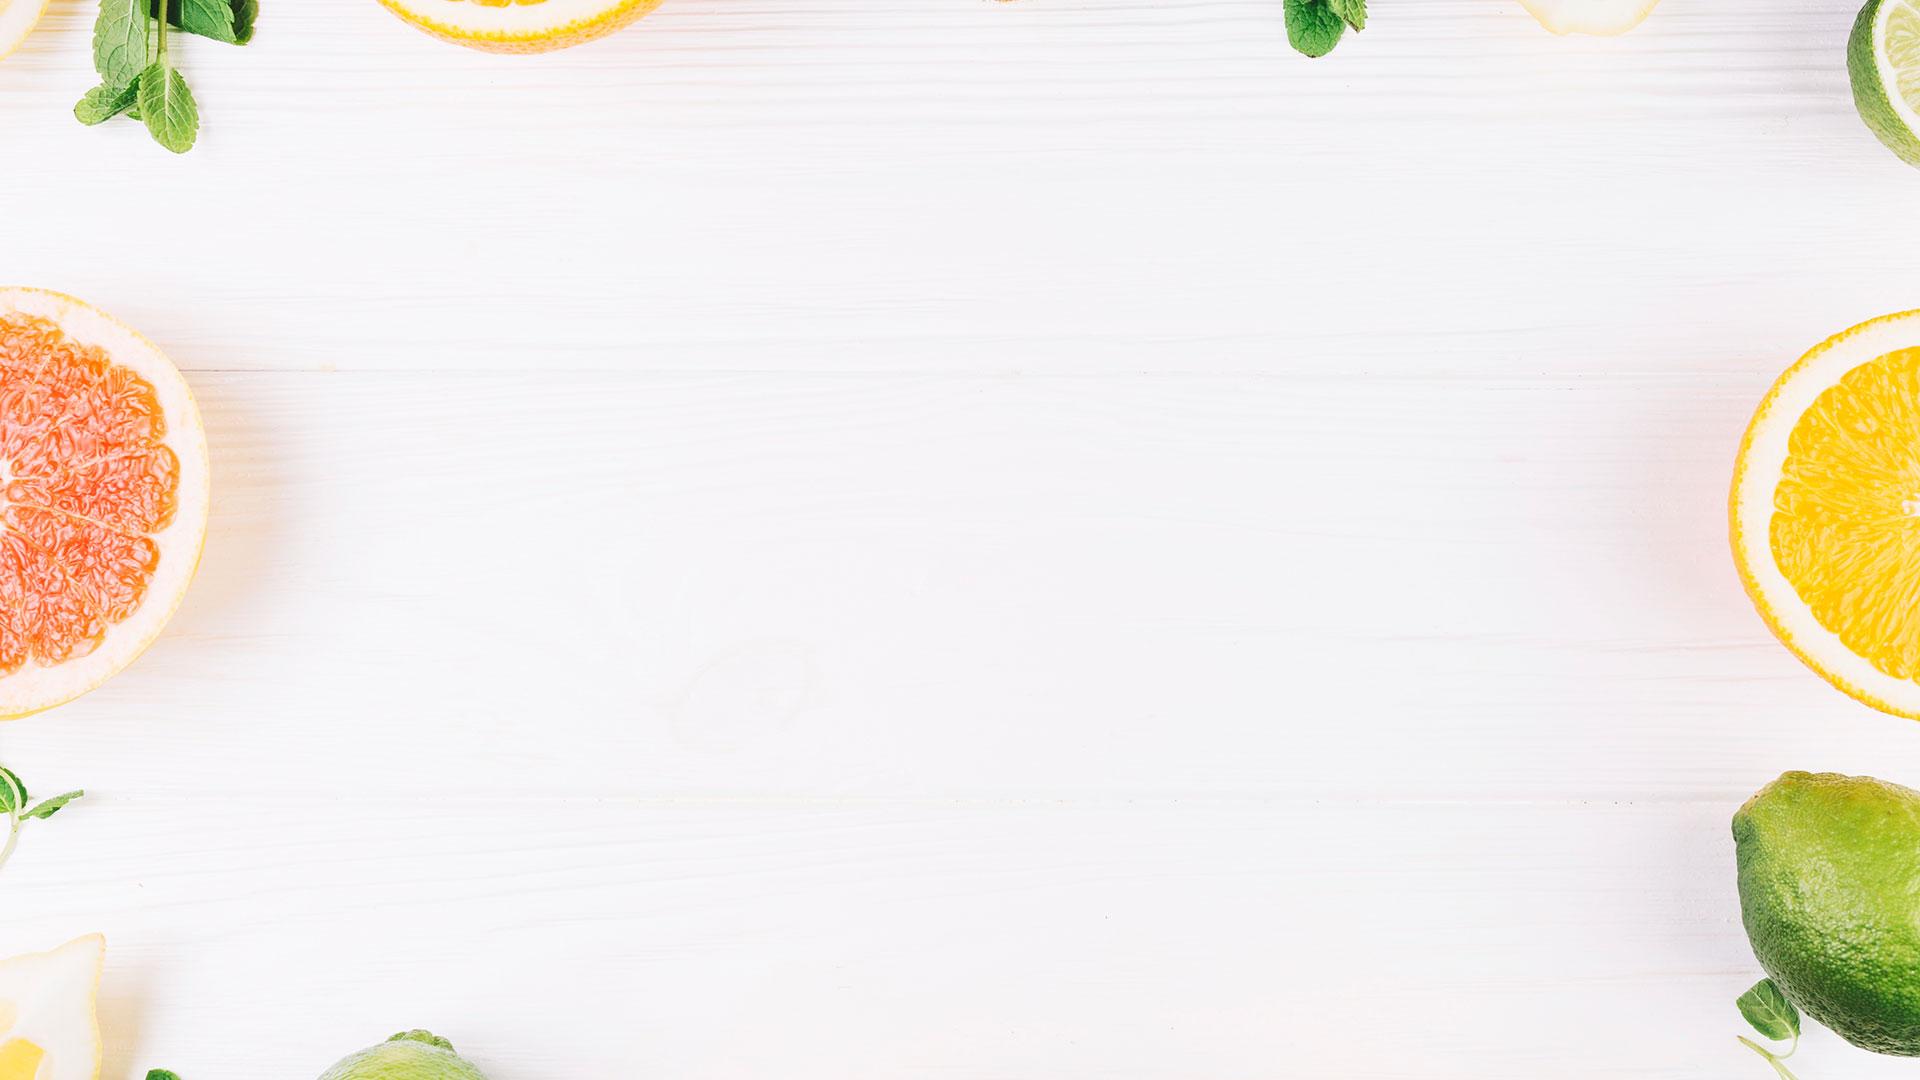 padernofrutta-frutta-e-verdura-slider-principale